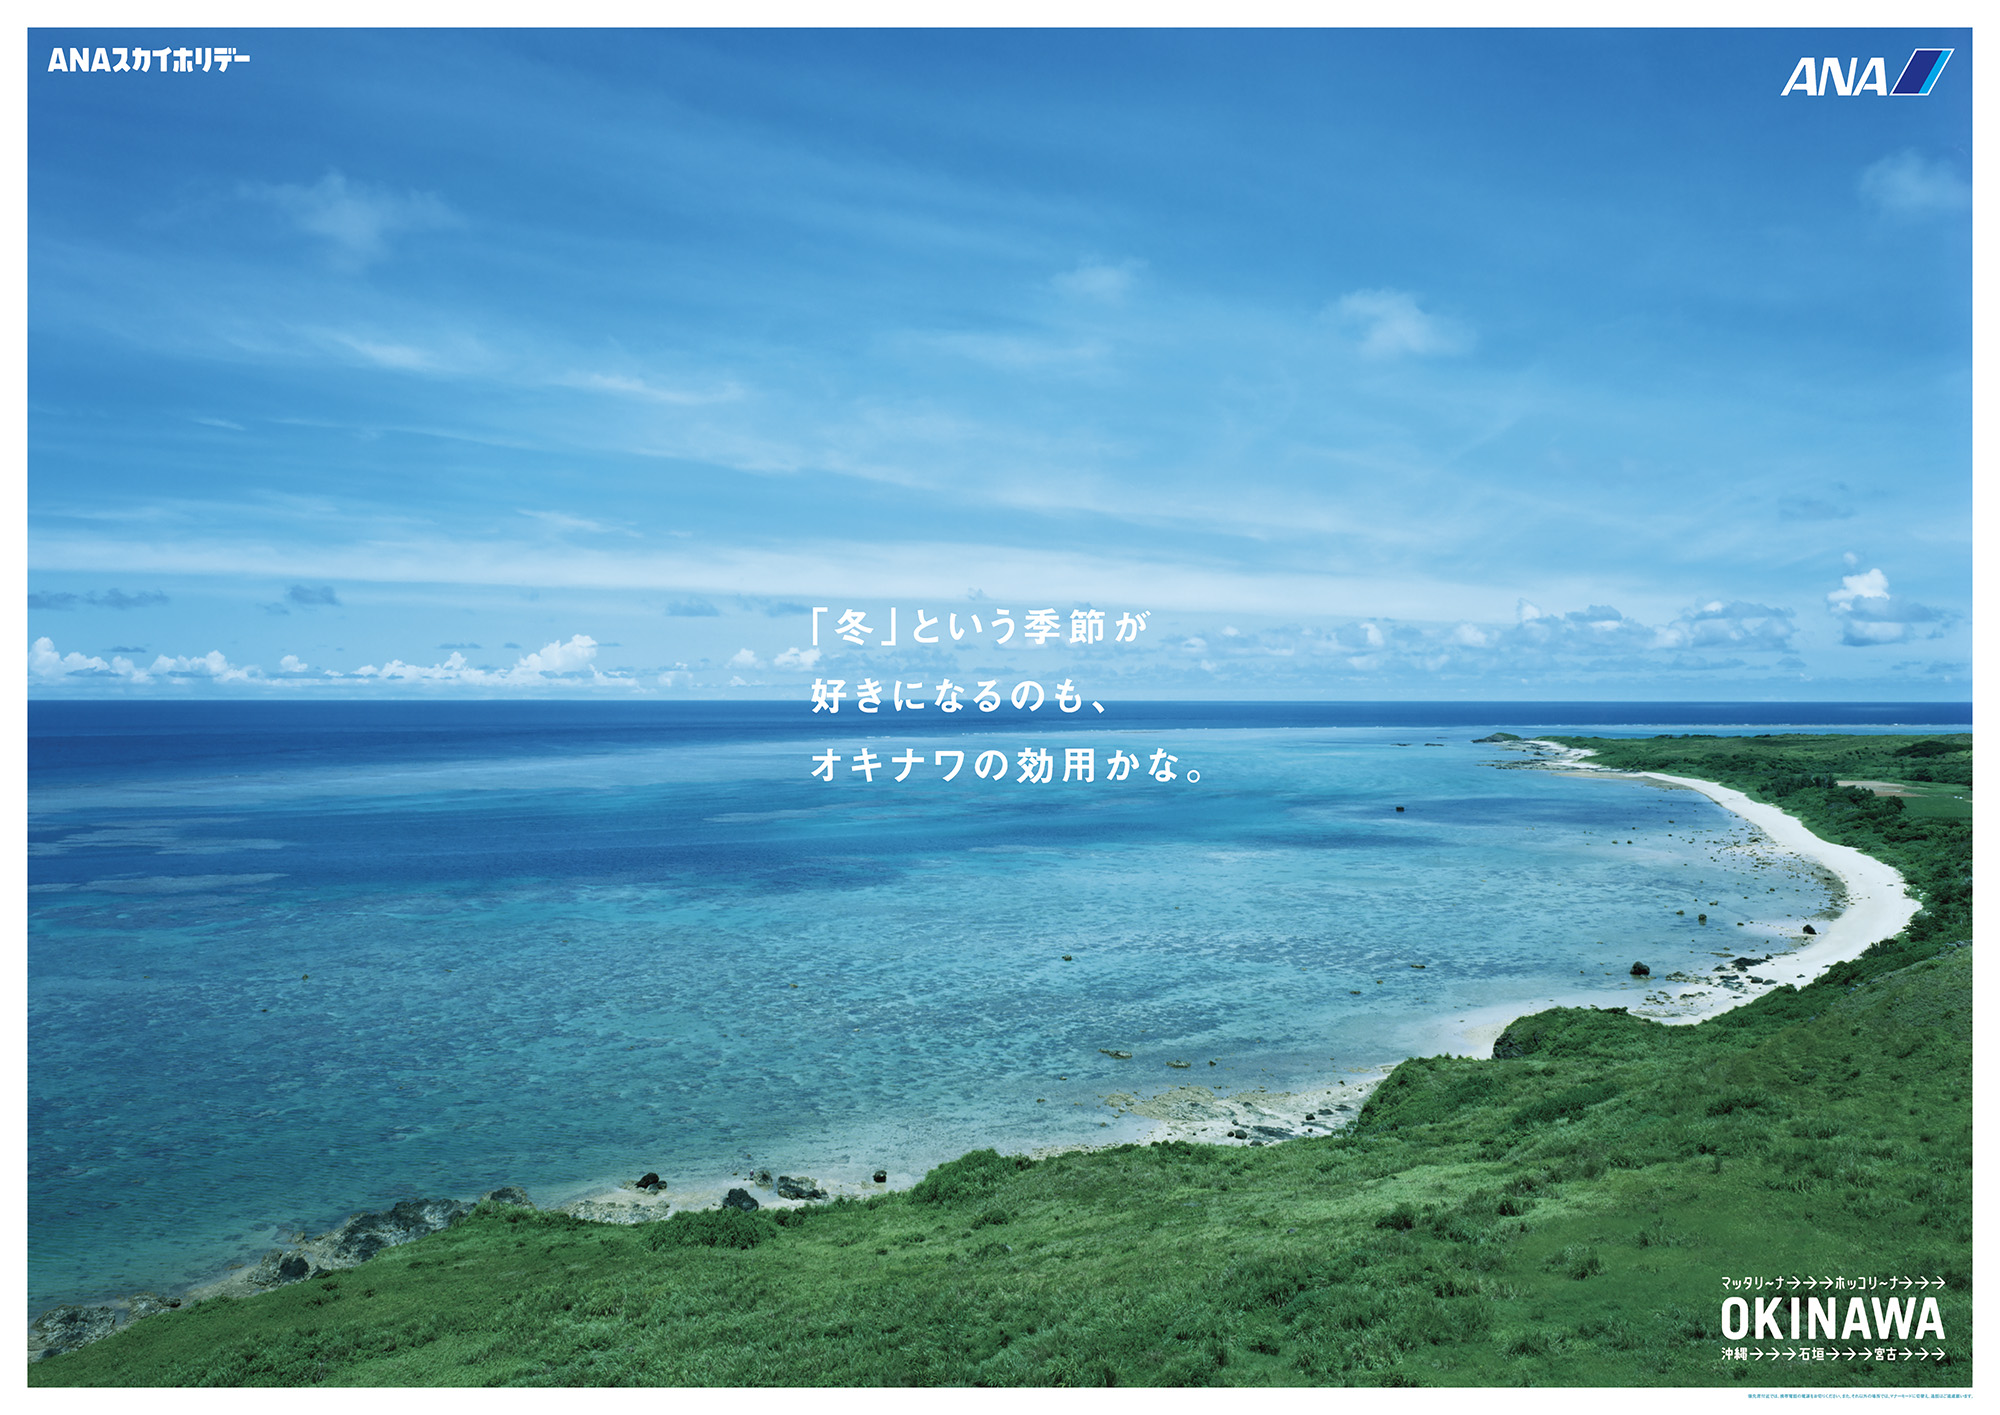 ana_01_平久保崎_2000px_72dpi.jpg